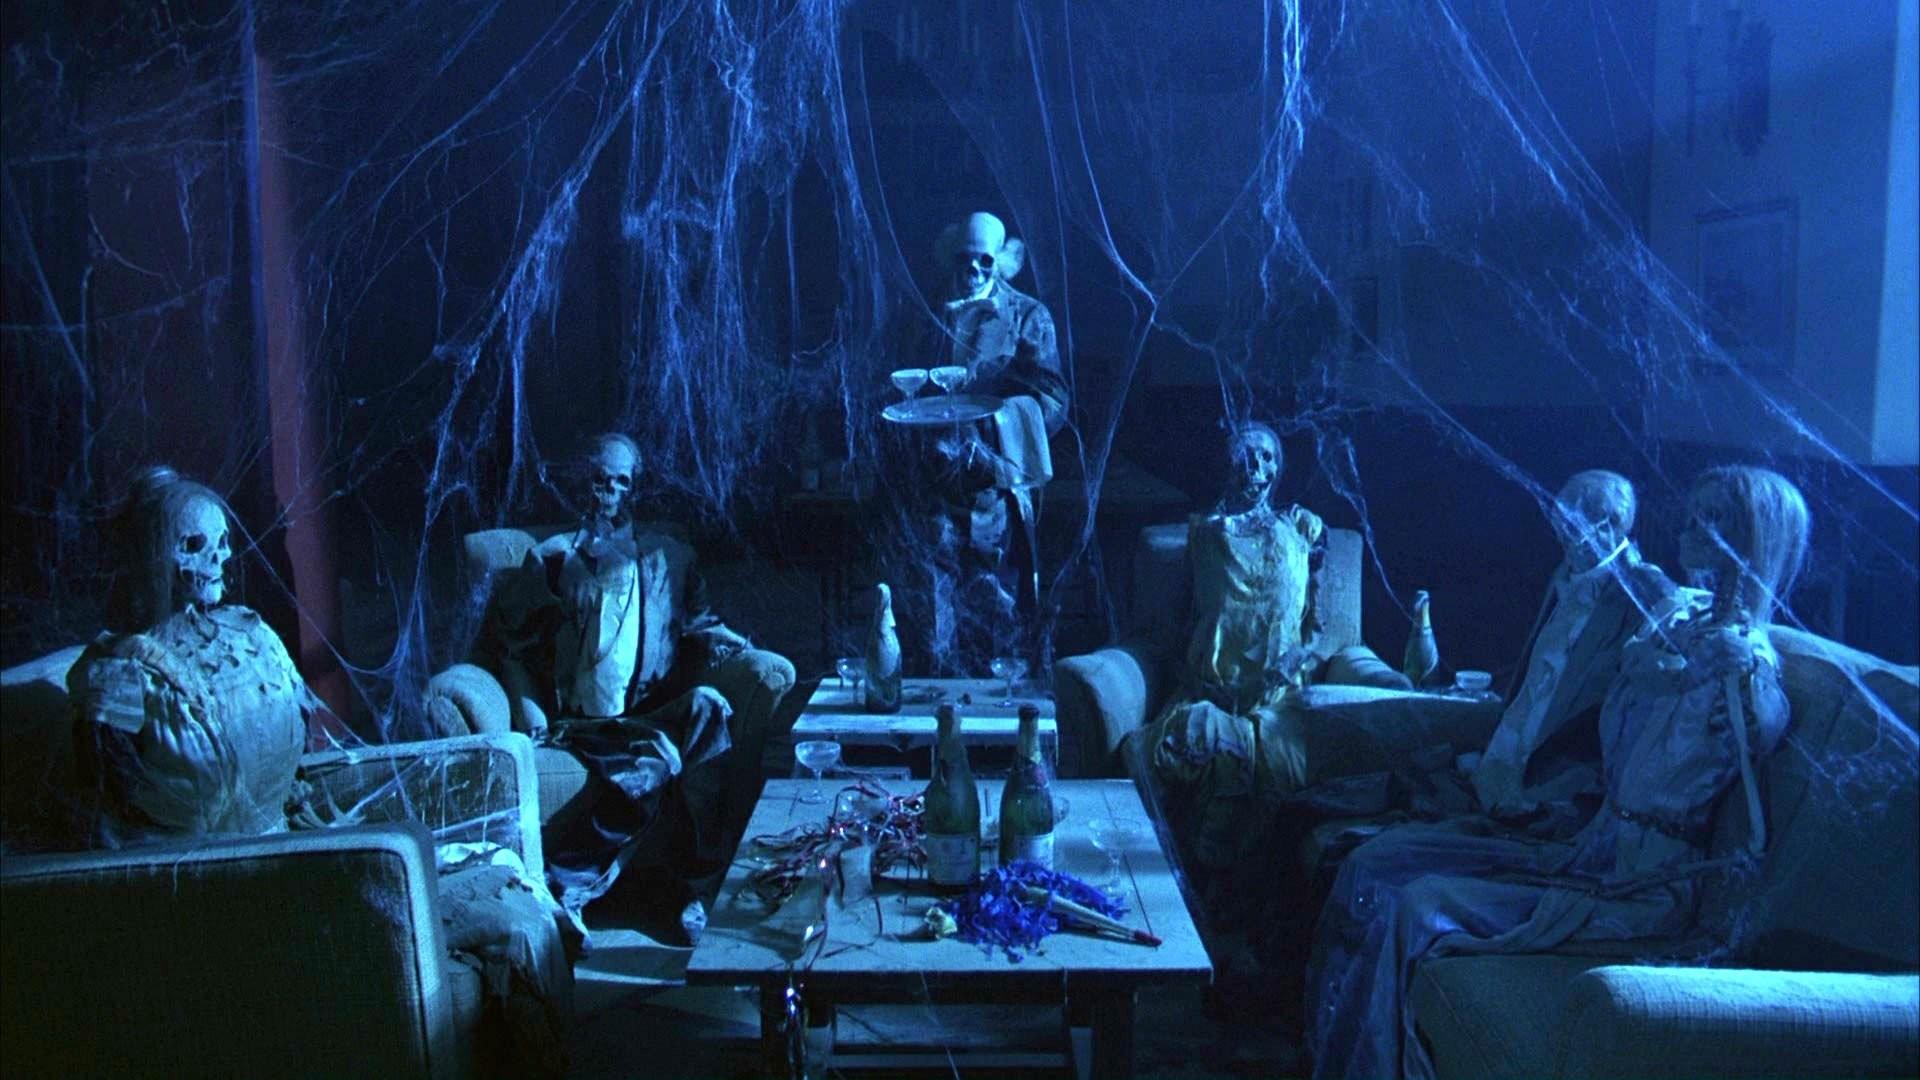 1920x1080 Classic Horror Wallpaper Mobile Is 4k Wallpaper Shining Room Of Skeletons 1920x1080 Wallpaper Teahub Io